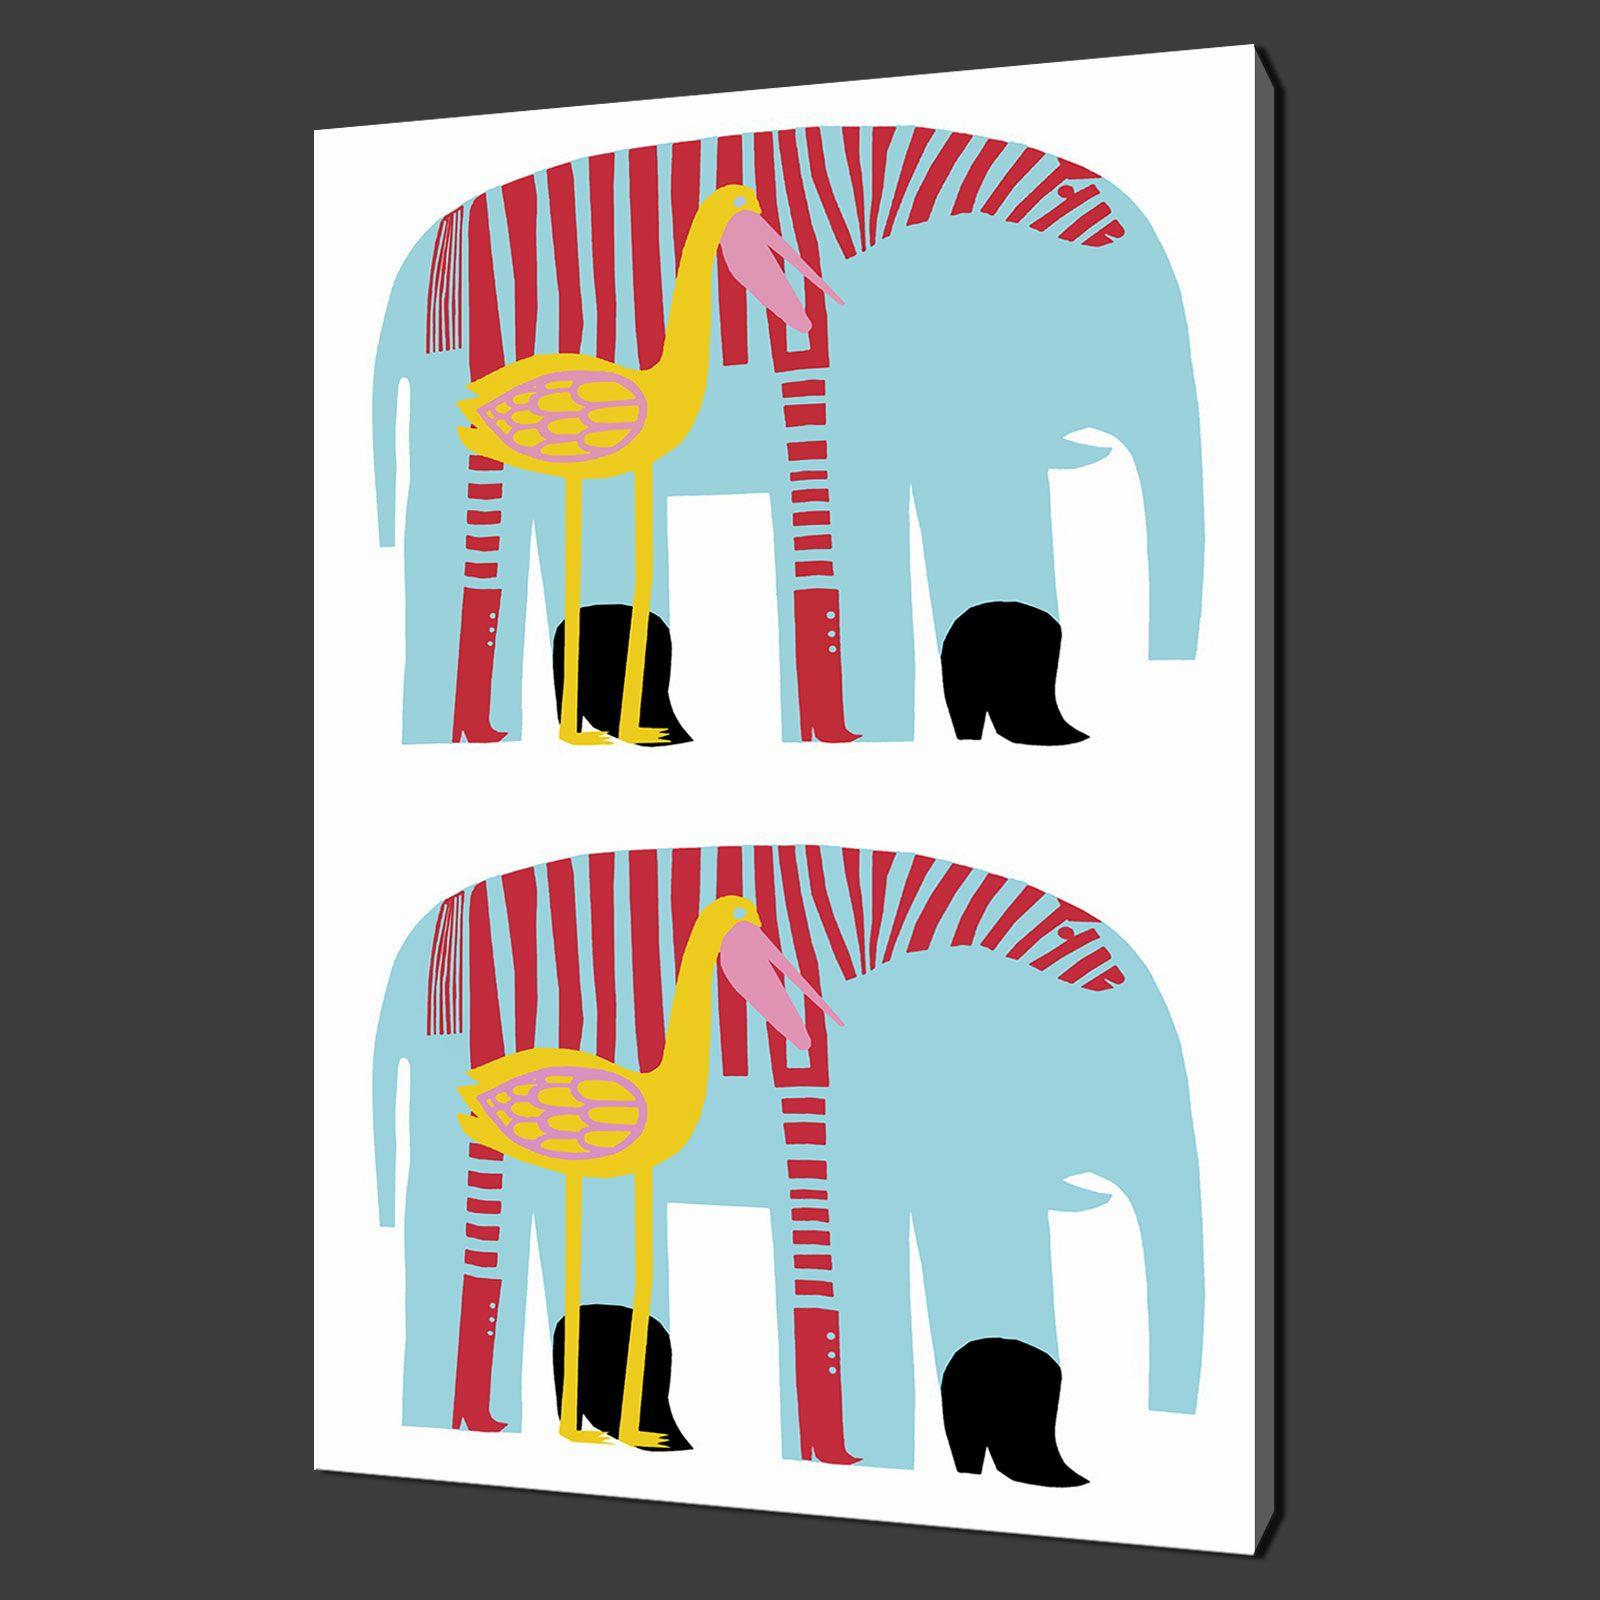 MARIMEKKO ELEPHANTS INSPIRED CANVAS PRINT KIDS ART MODERN DESIGN FREE UK P&P